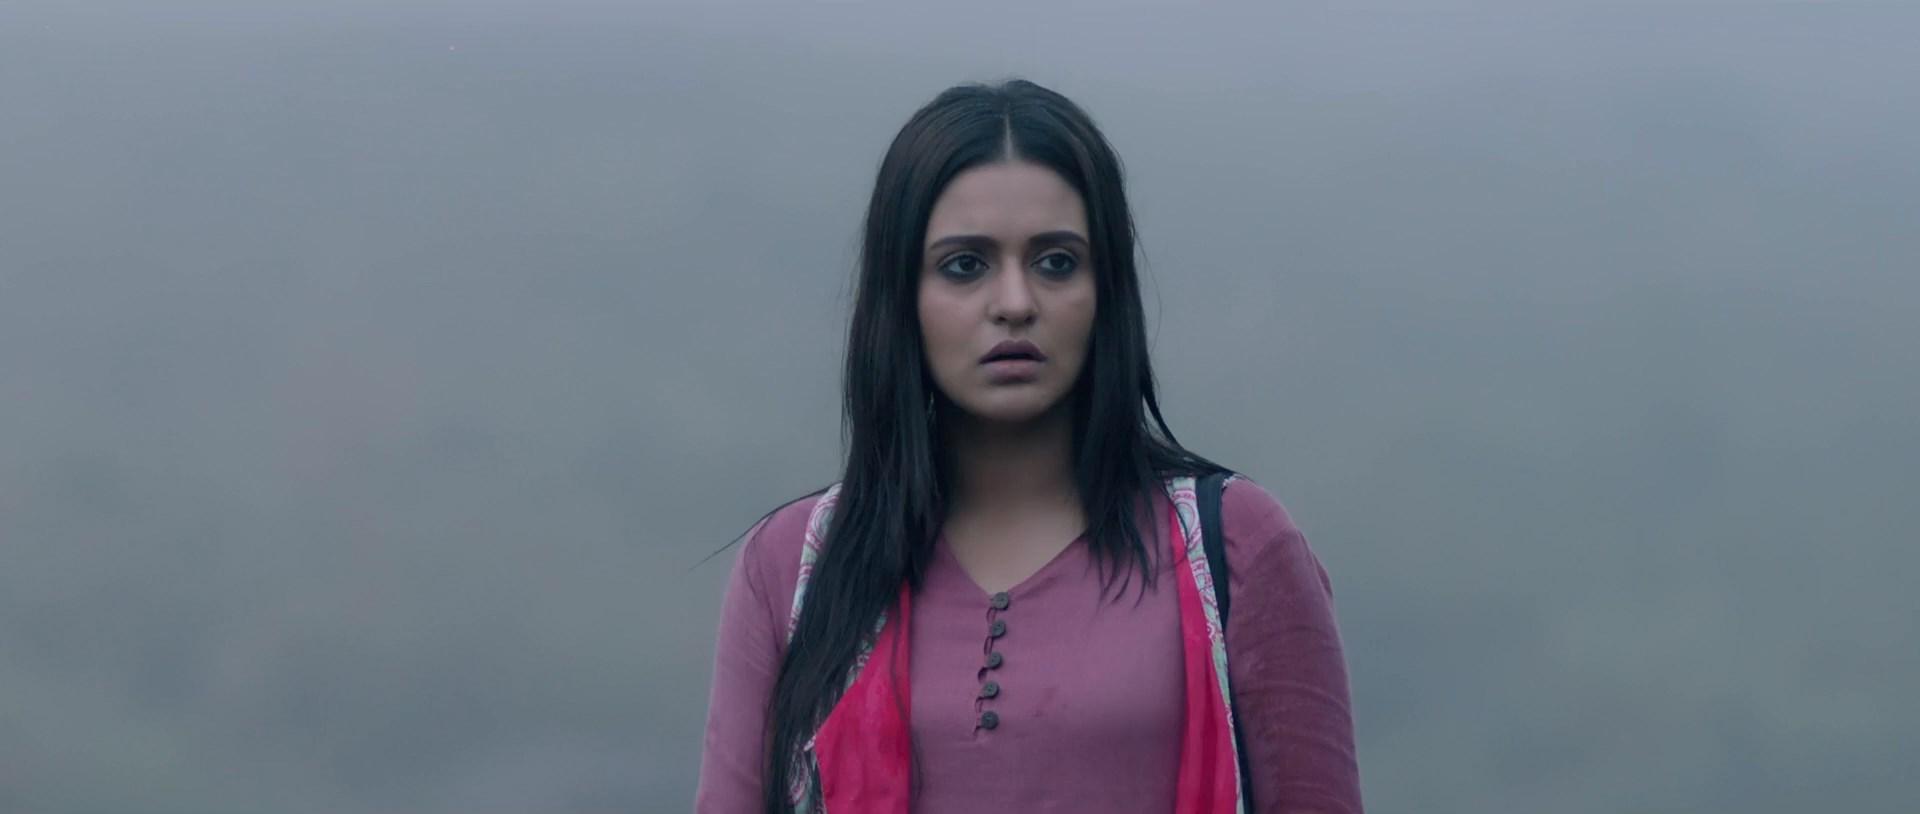 KAYA The Mystery Unfolds 2021 Bengali Movie 1080p WEB DL x264 AAC.mp4 snapshot 01.55.37.791